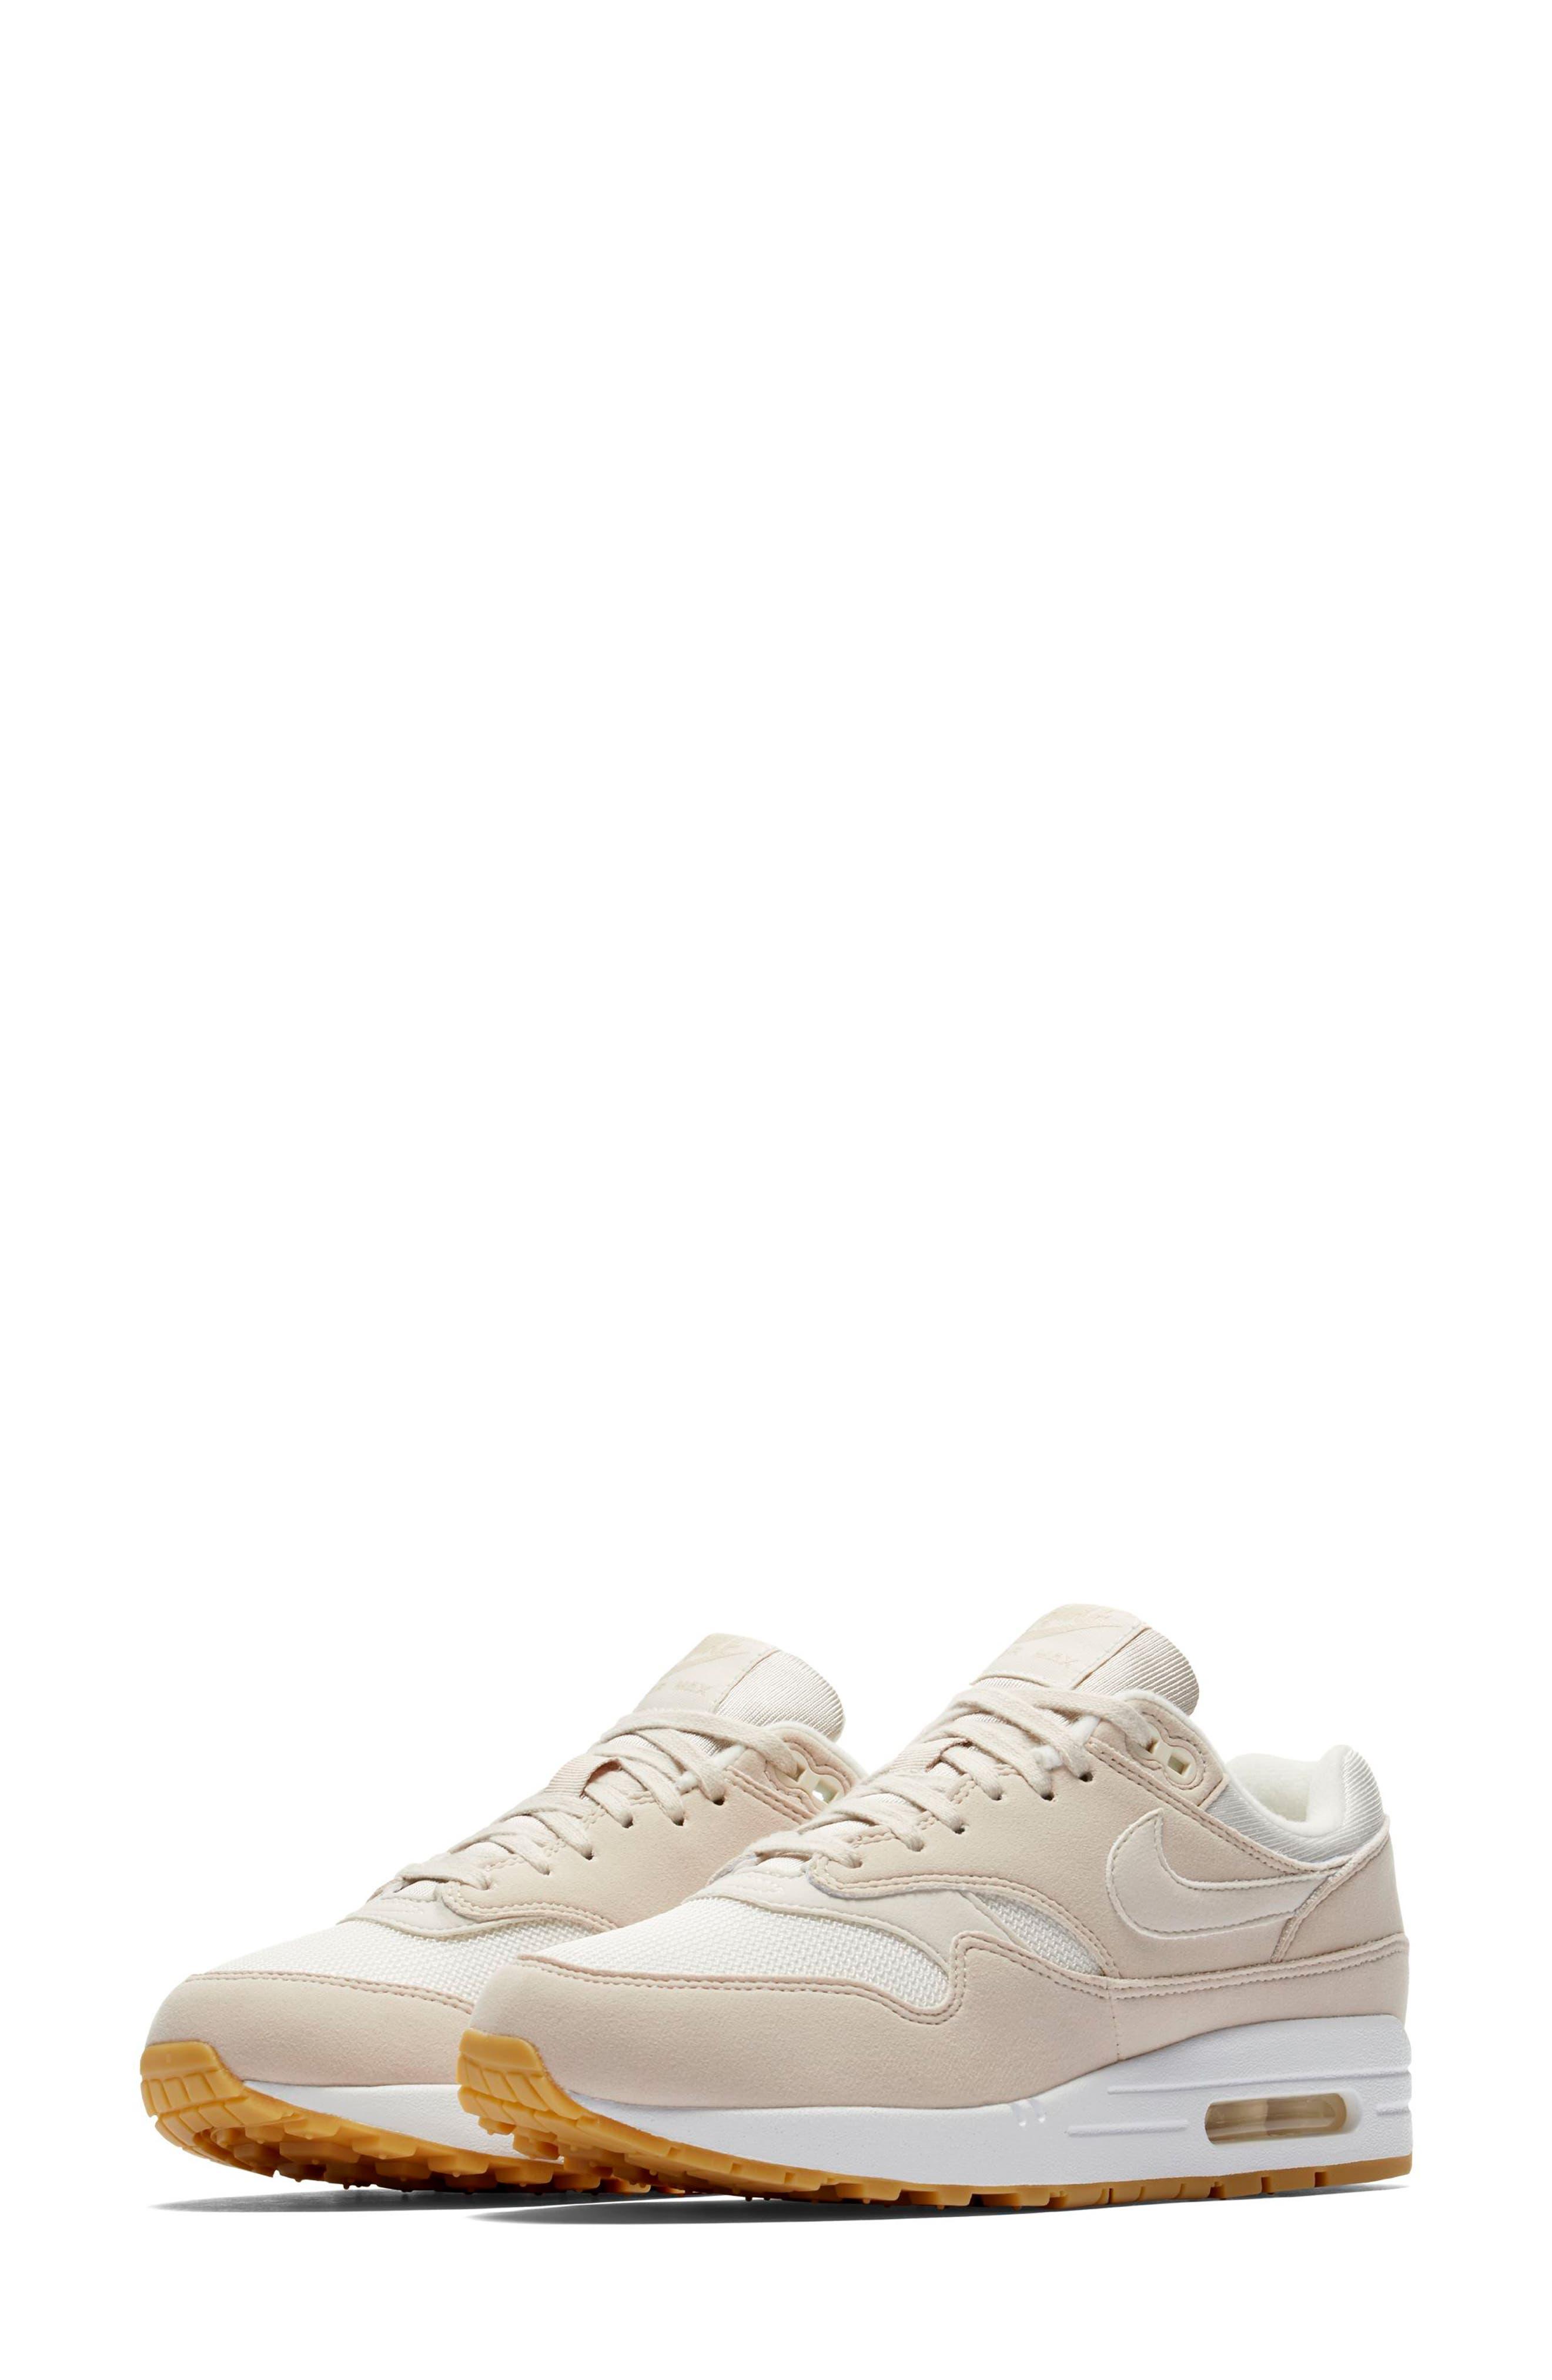 Air Max 1 Sneaker,                             Main thumbnail 1, color,                             DESERT SAND